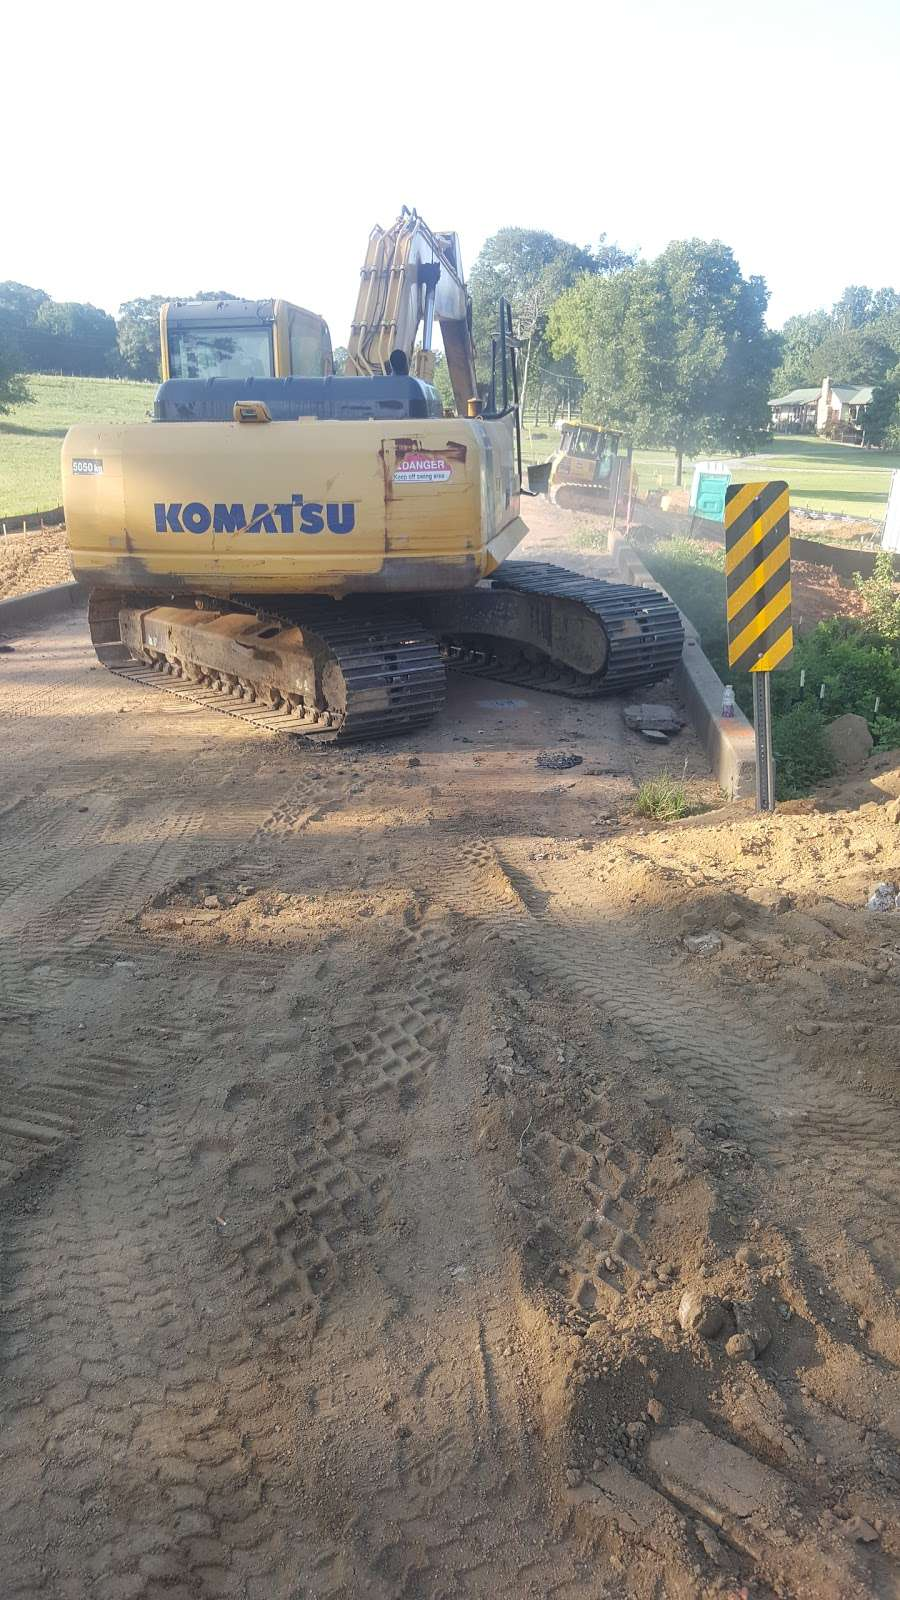 RBP Plumbing LLC - plumber  | Photo 1 of 2 | Address: 3187 Gordon Rd, York, SC 29745, USA | Phone: (803) 325-1617